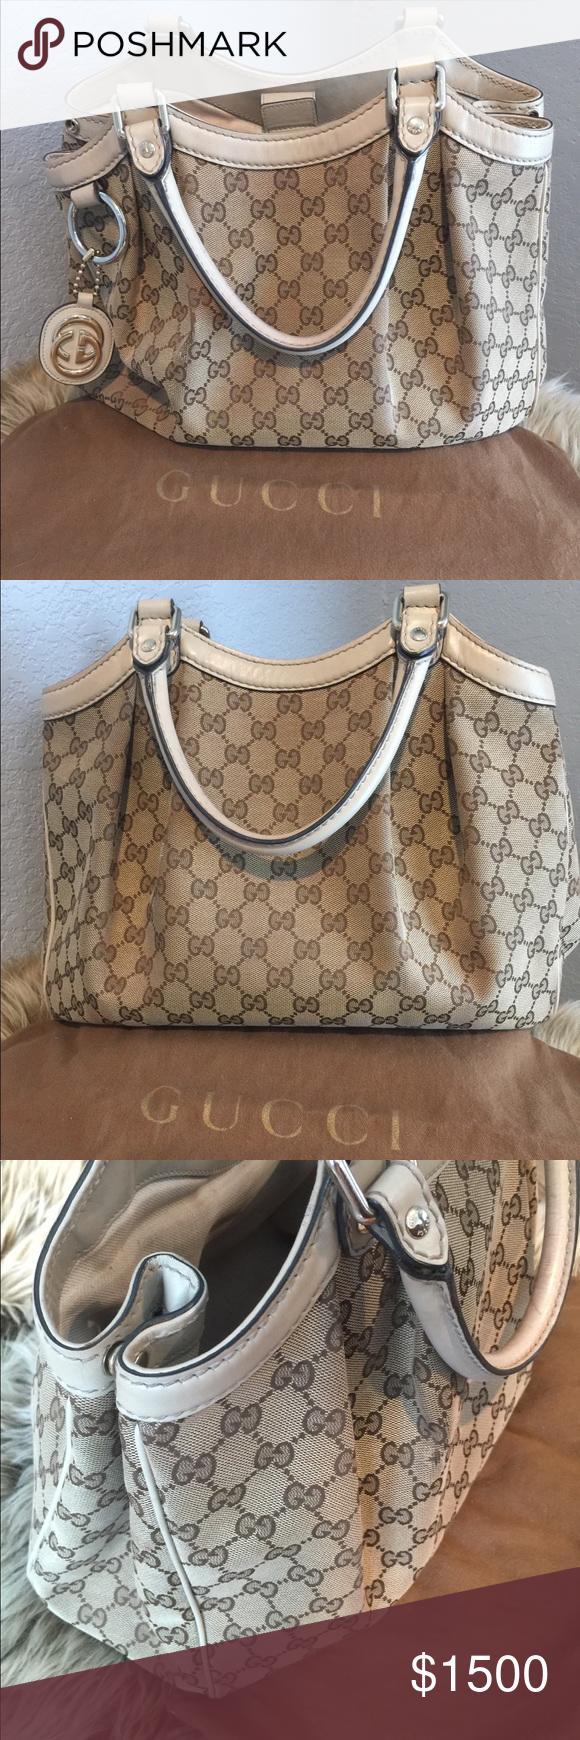 cc21053954b0f9 Gucci medium Sukey tote in cream Gucci Sukey Medium Beige Original GG  Monogram Canvas Leather Tote. I like to be 100% honest w/ everything I sell  & I did my ...